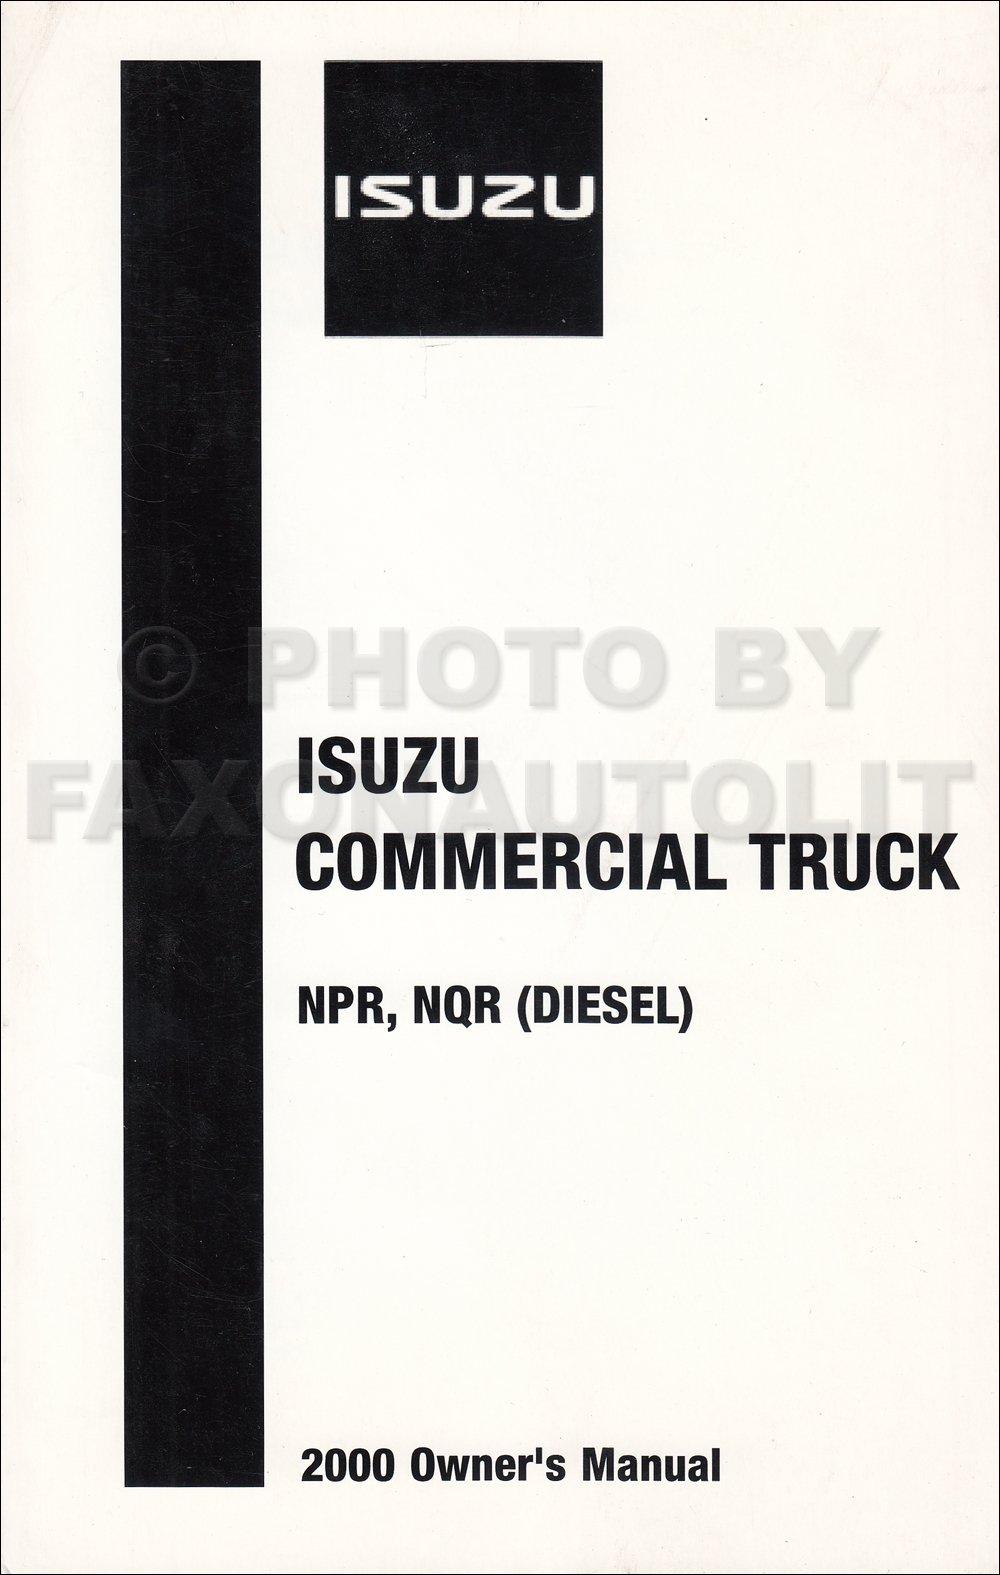 Isuzu NPR NQR Diesel 2000 Commercial Truck Owners Manual: Isuzu Truck of  America INC: Amazon.com: Books